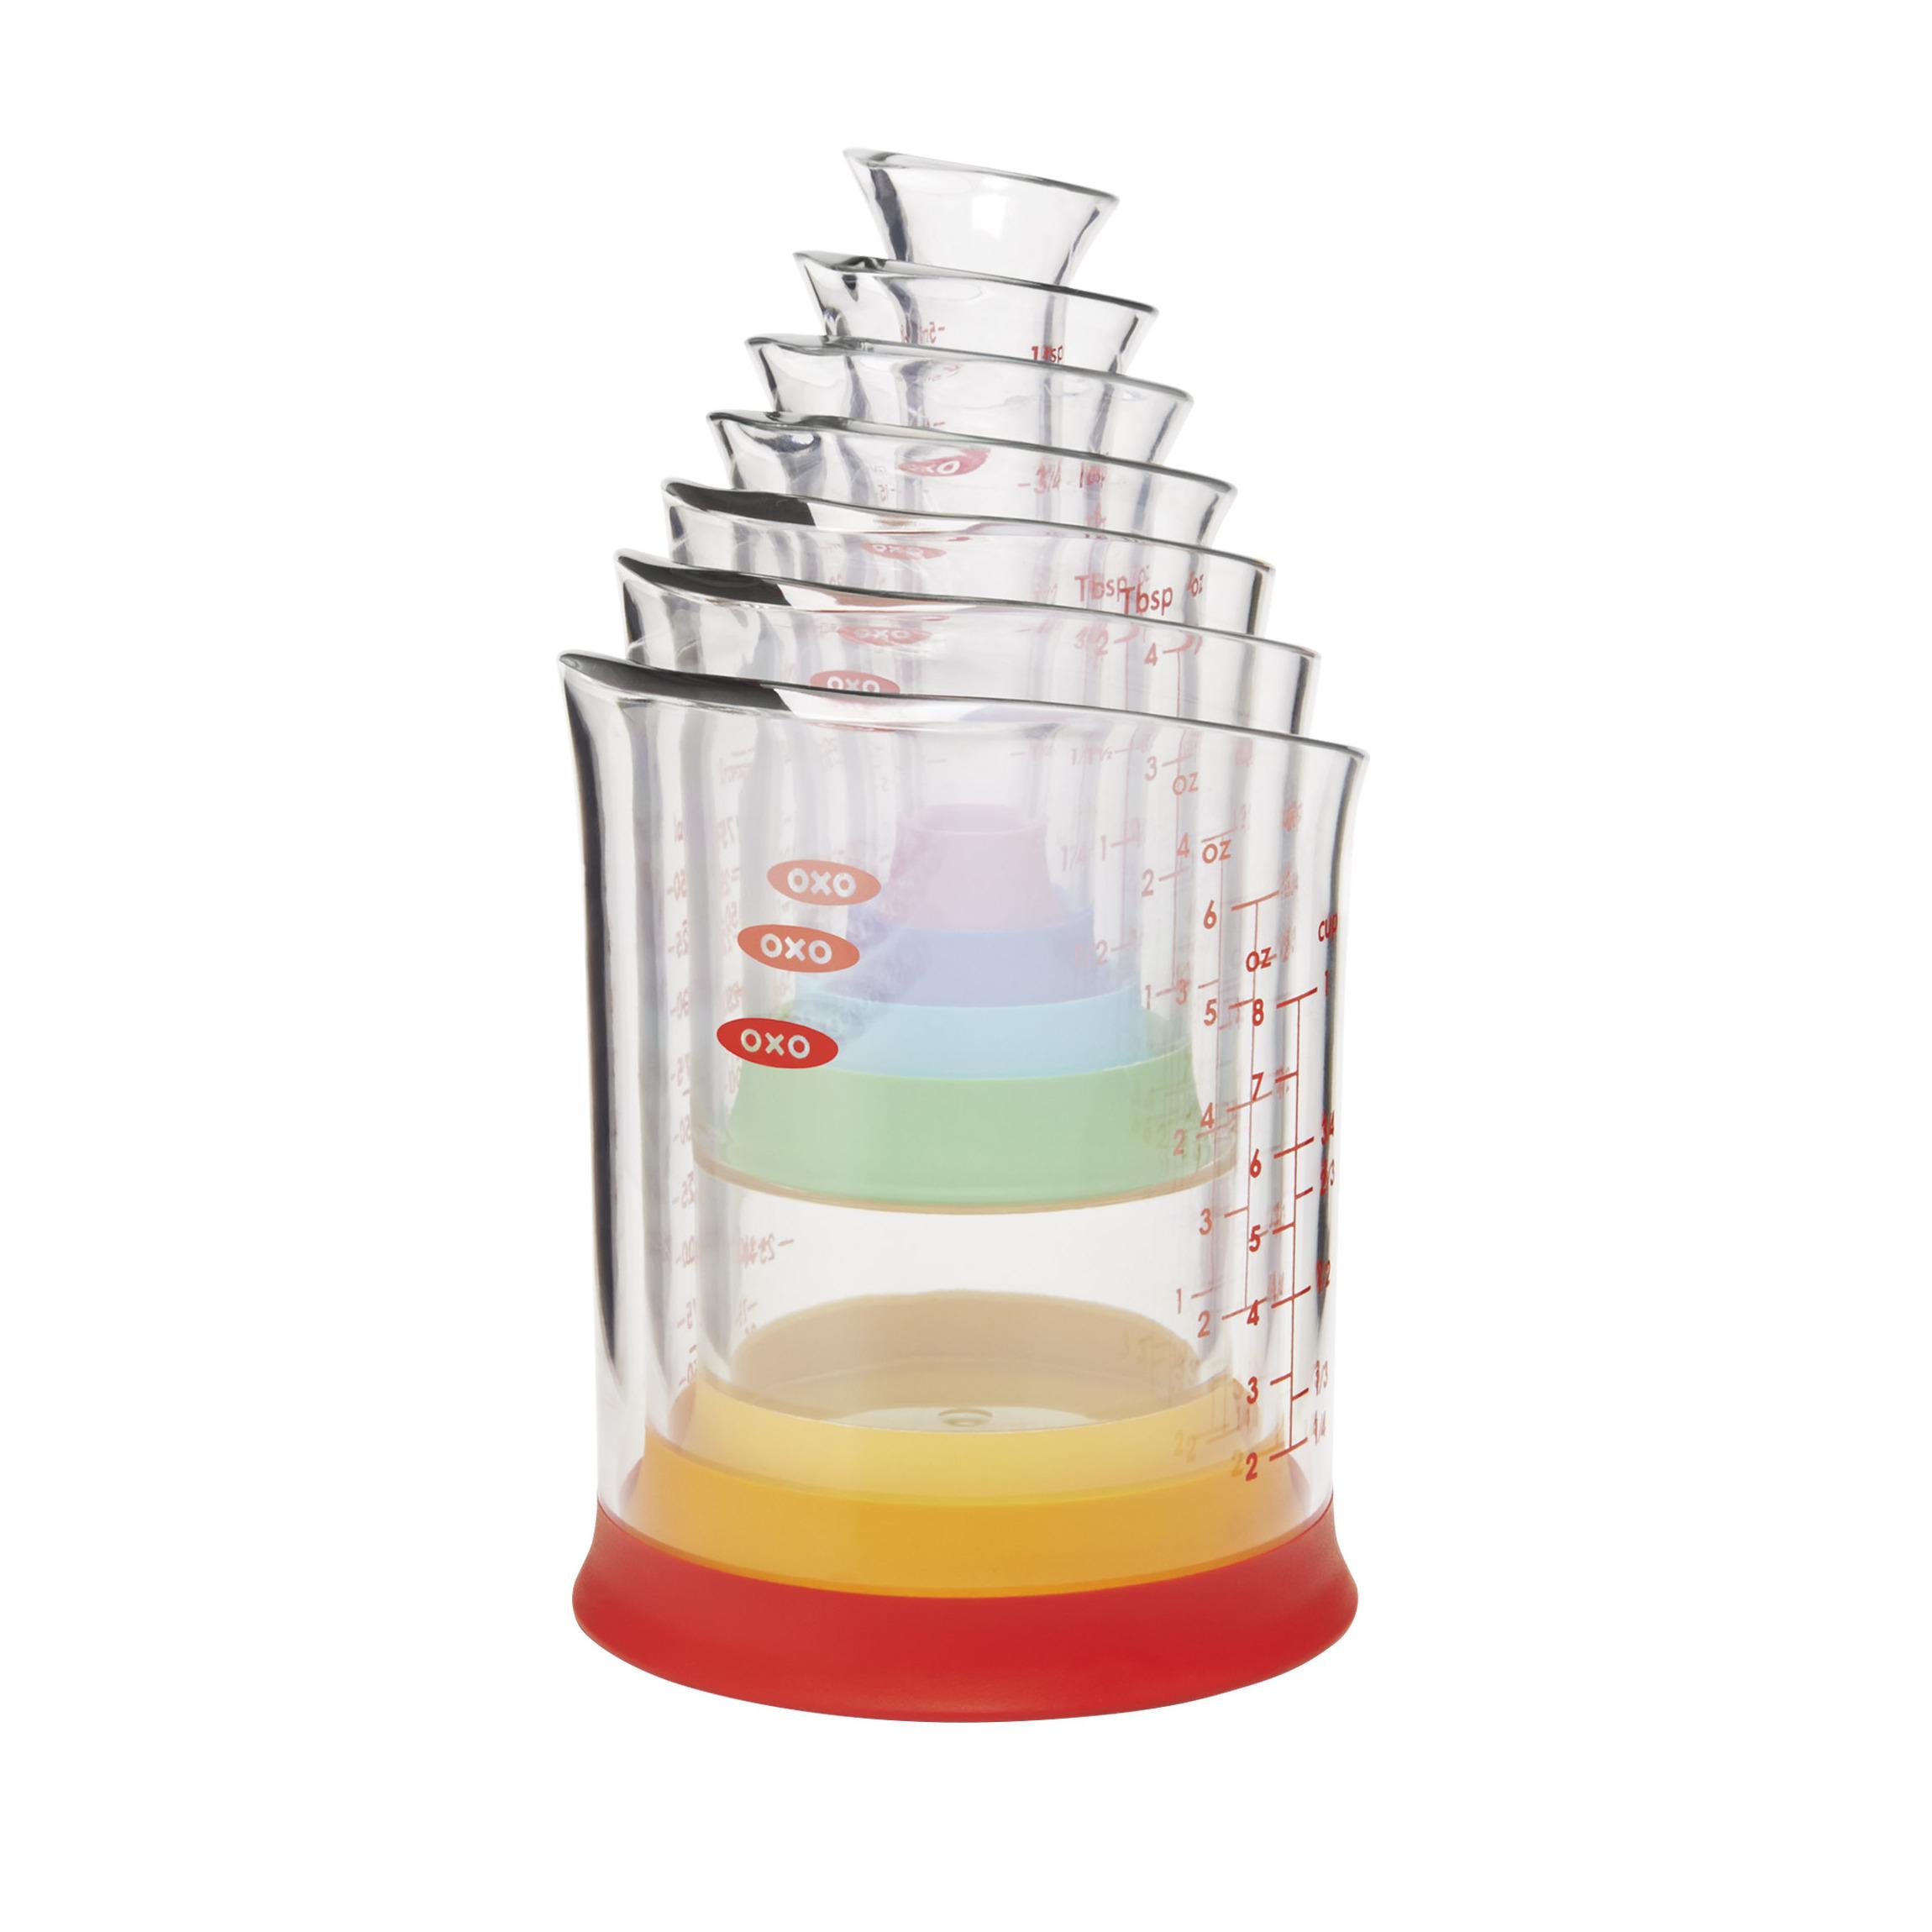 7 Piece Liquid Measuring Beaker Set